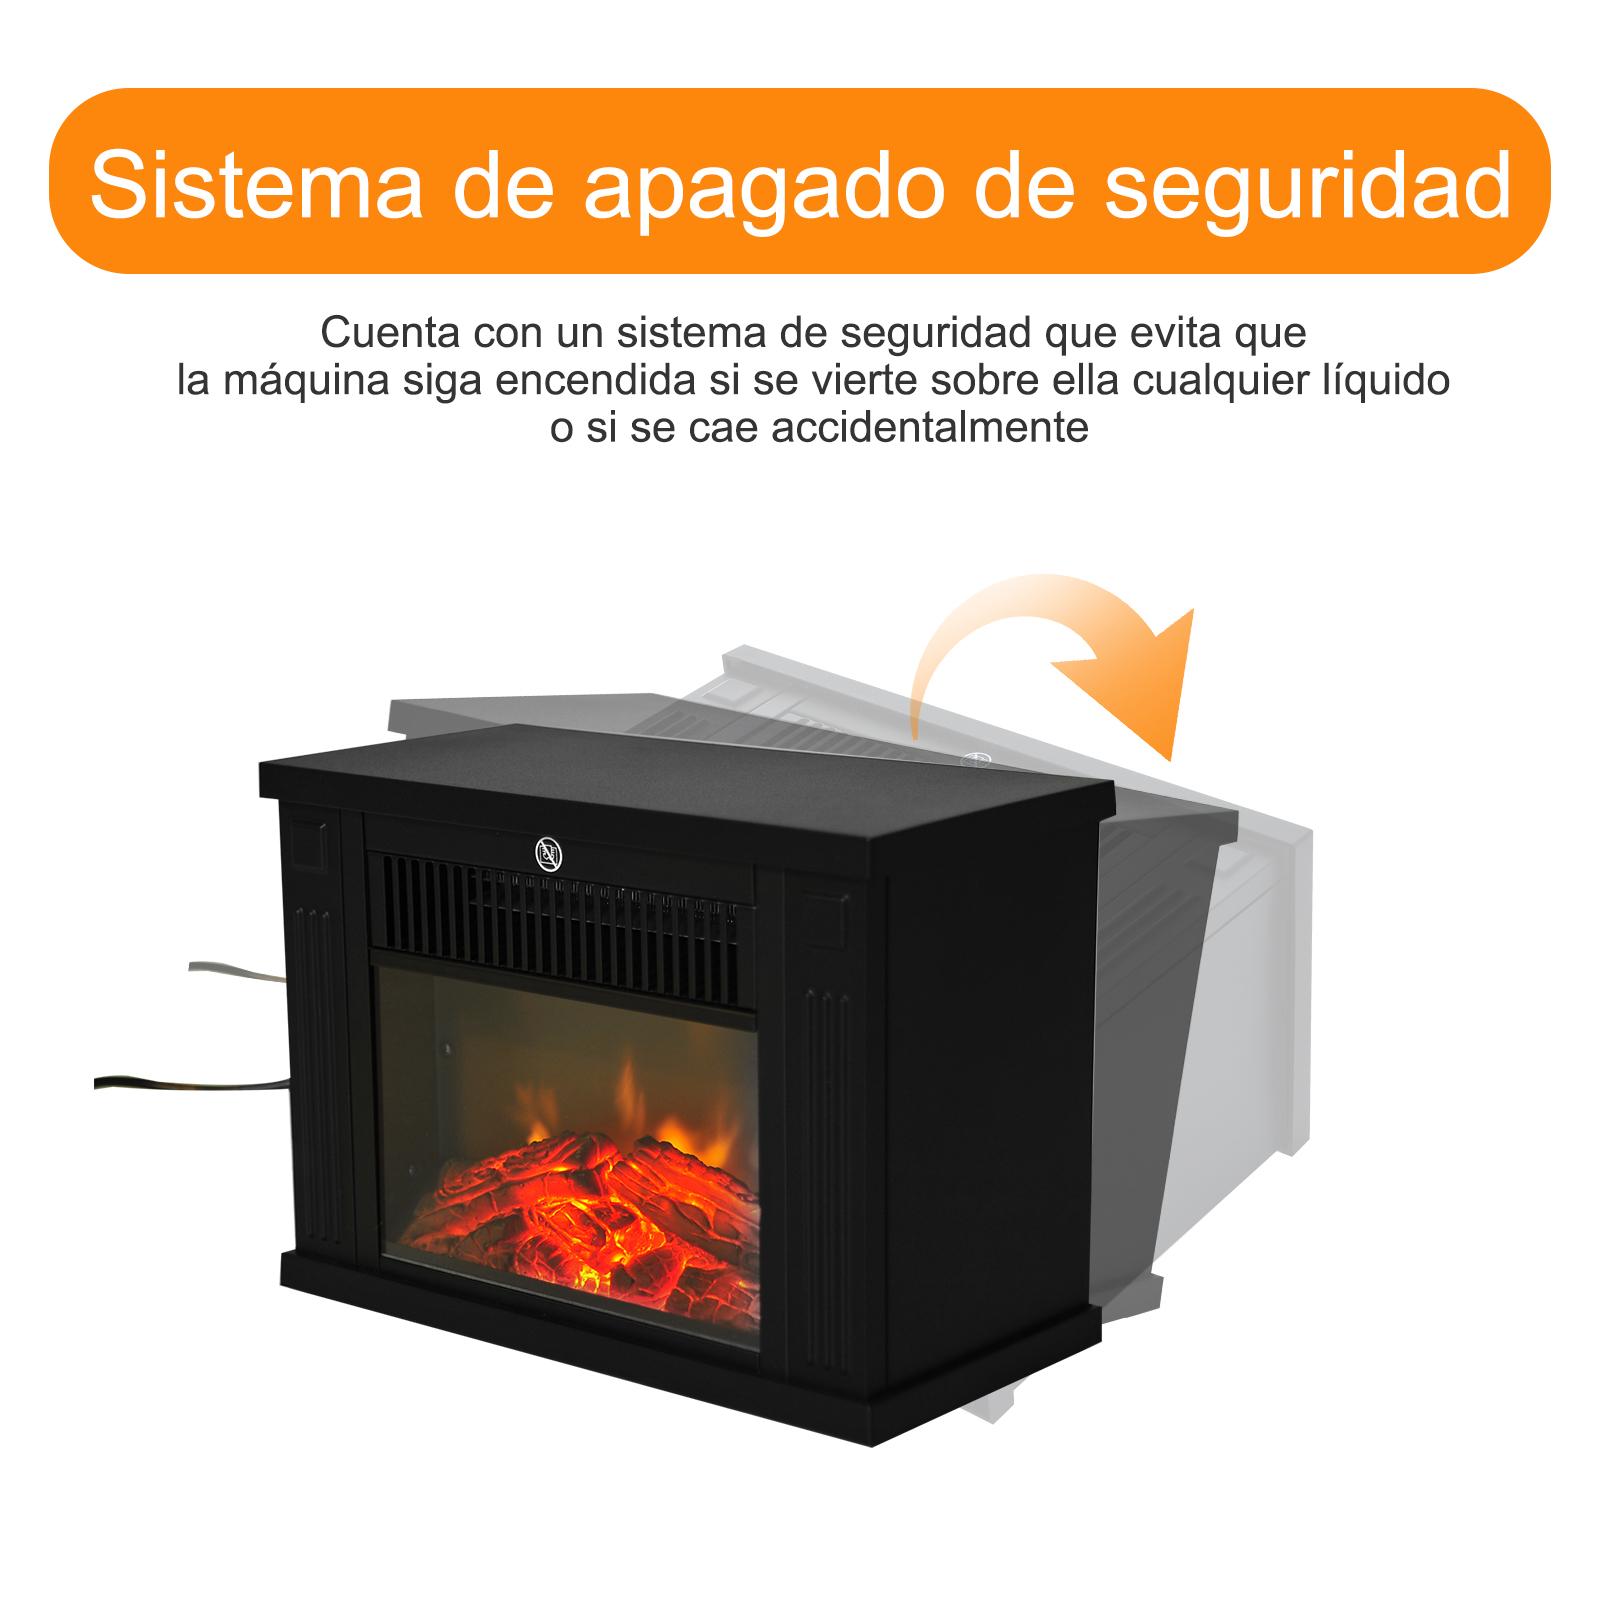 Chimenea-Electrica-de-Pared-Vertical-Estufas-Electricas-Llama-LED-6-Tipos-Nuevo miniatura 18